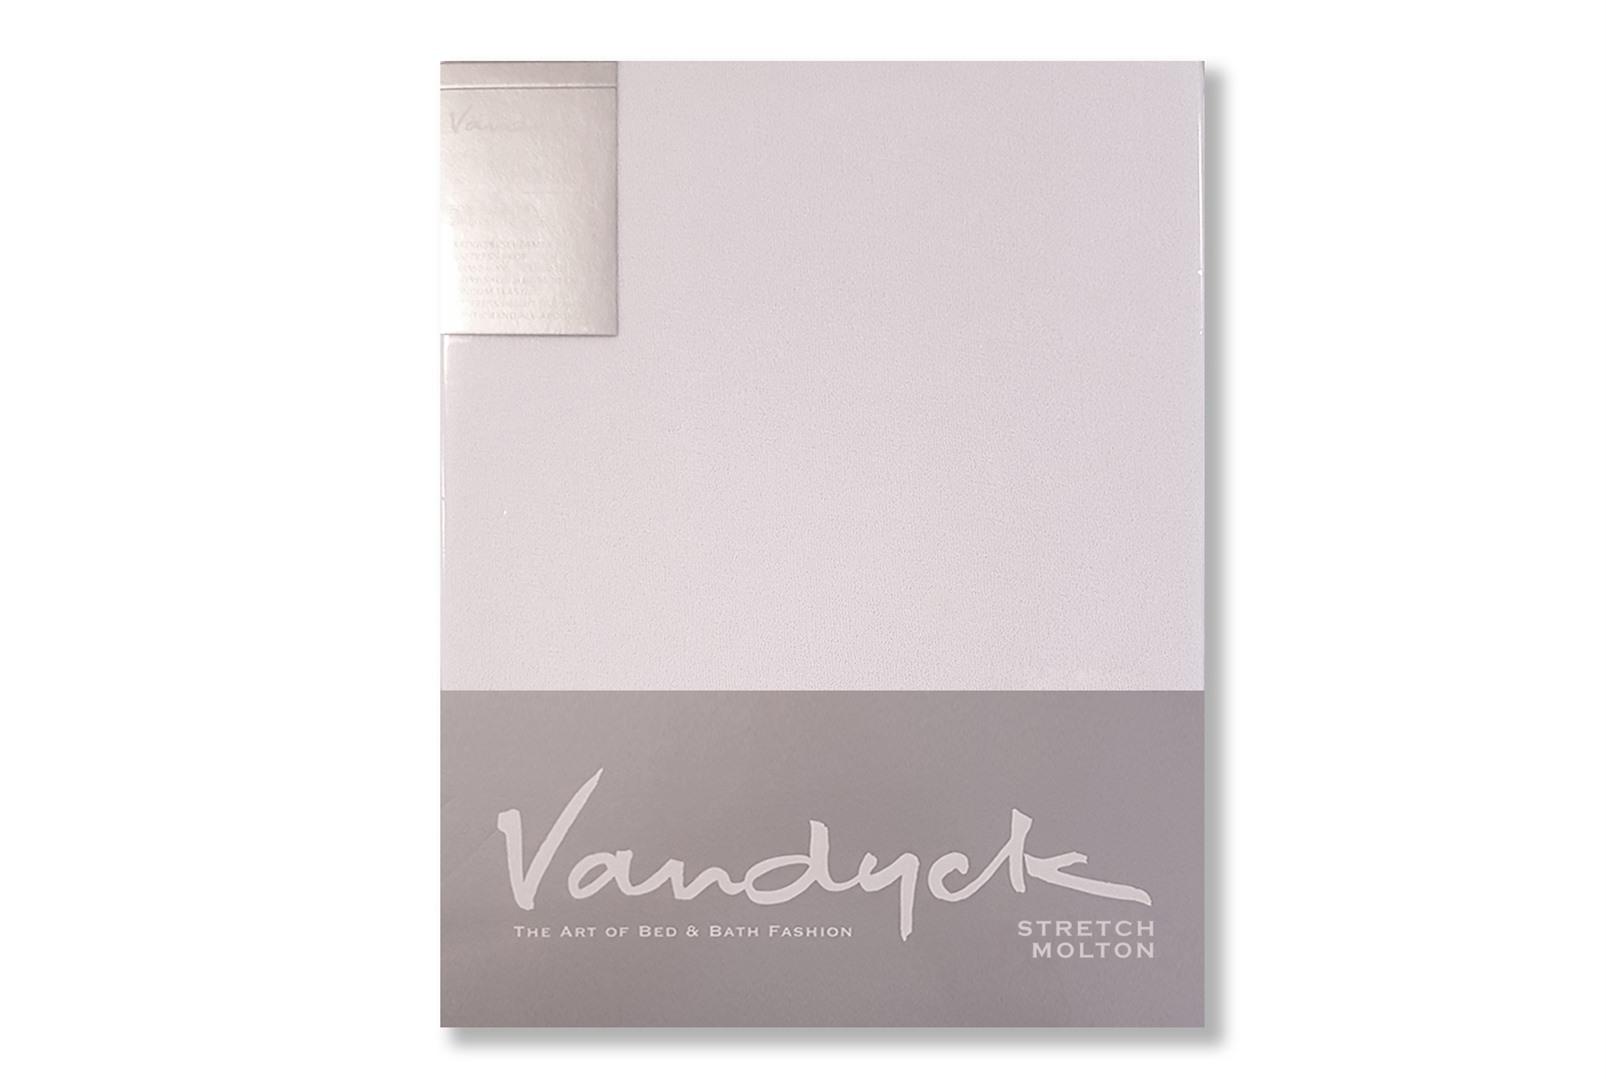 matrasbeschermer molton stretch topper 180 200 x 200 220 krea. Black Bedroom Furniture Sets. Home Design Ideas